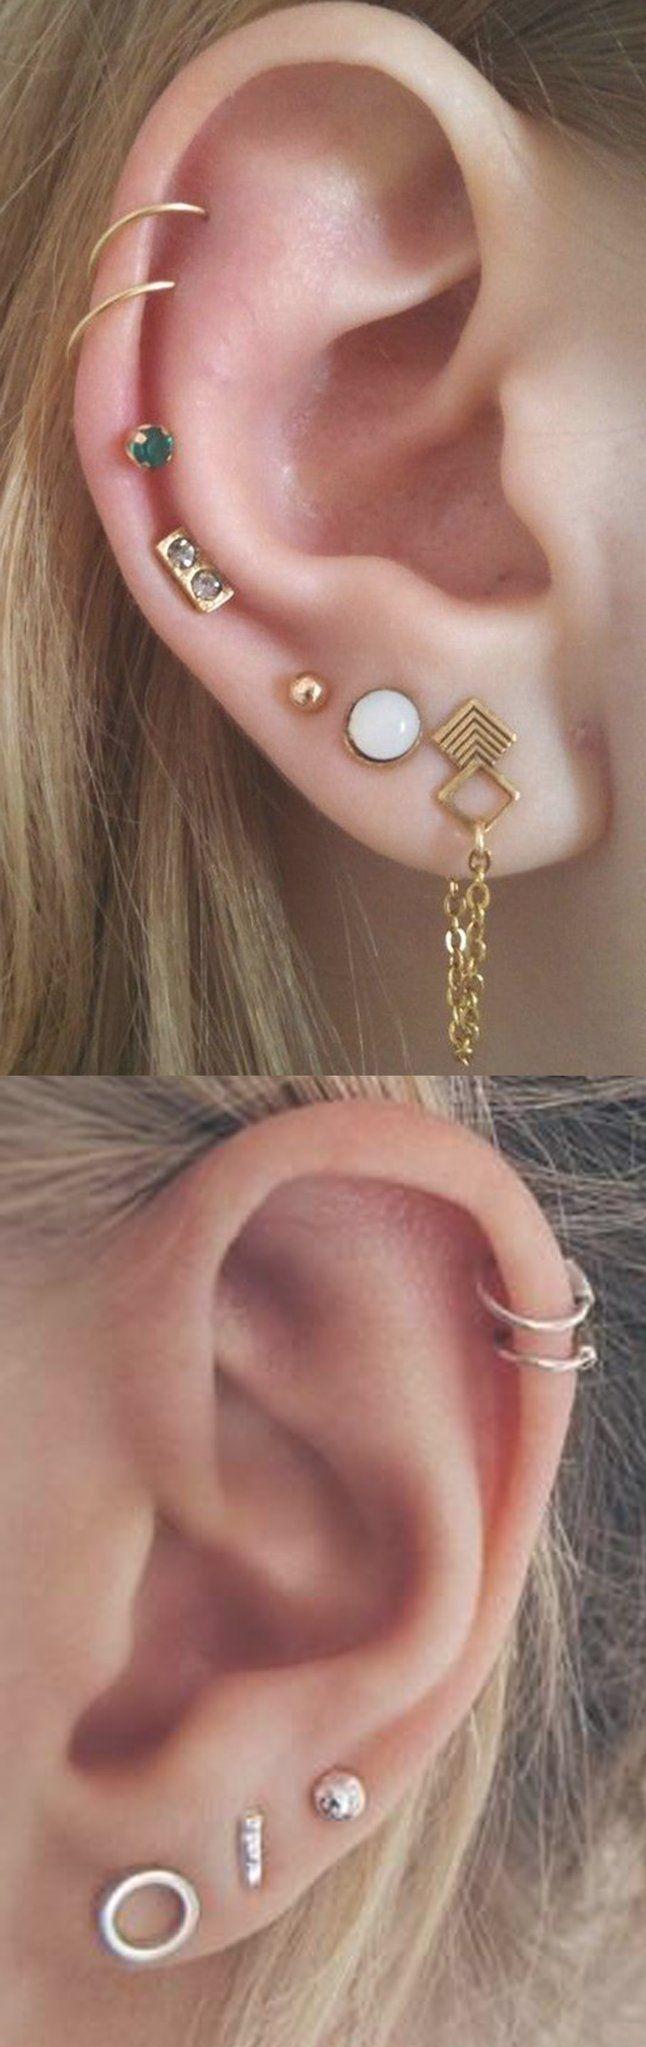 Ear piercing ideas simple   Ear Piercing Ideas that are Trending NOW   Cartilage piercings